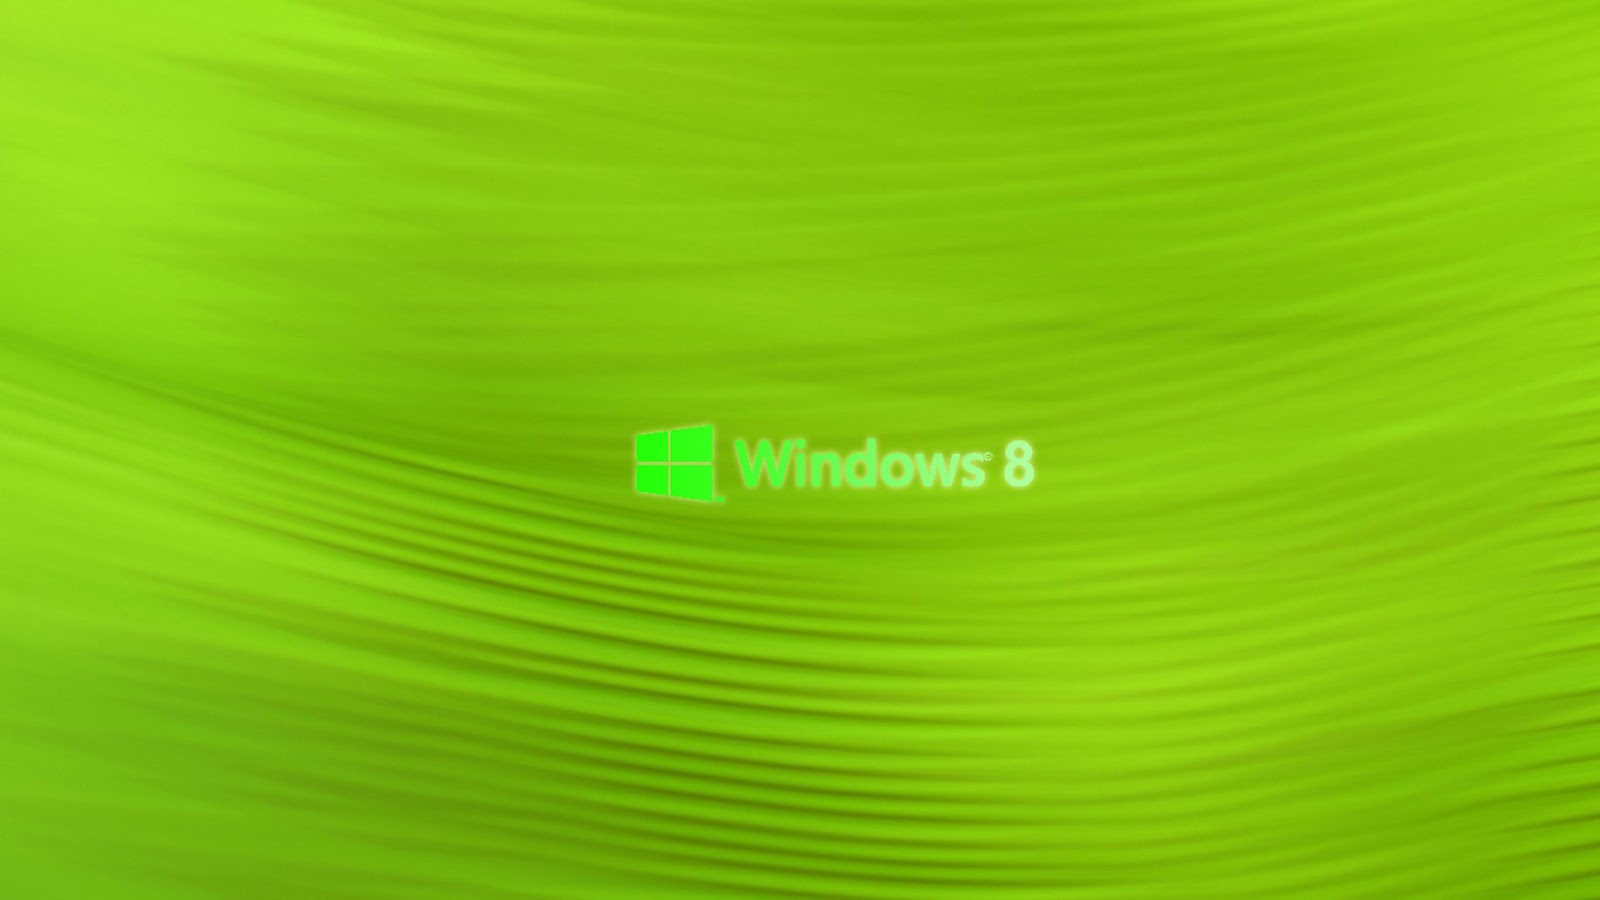 Windows 8 HD Wallpapers - HD Wallpapers